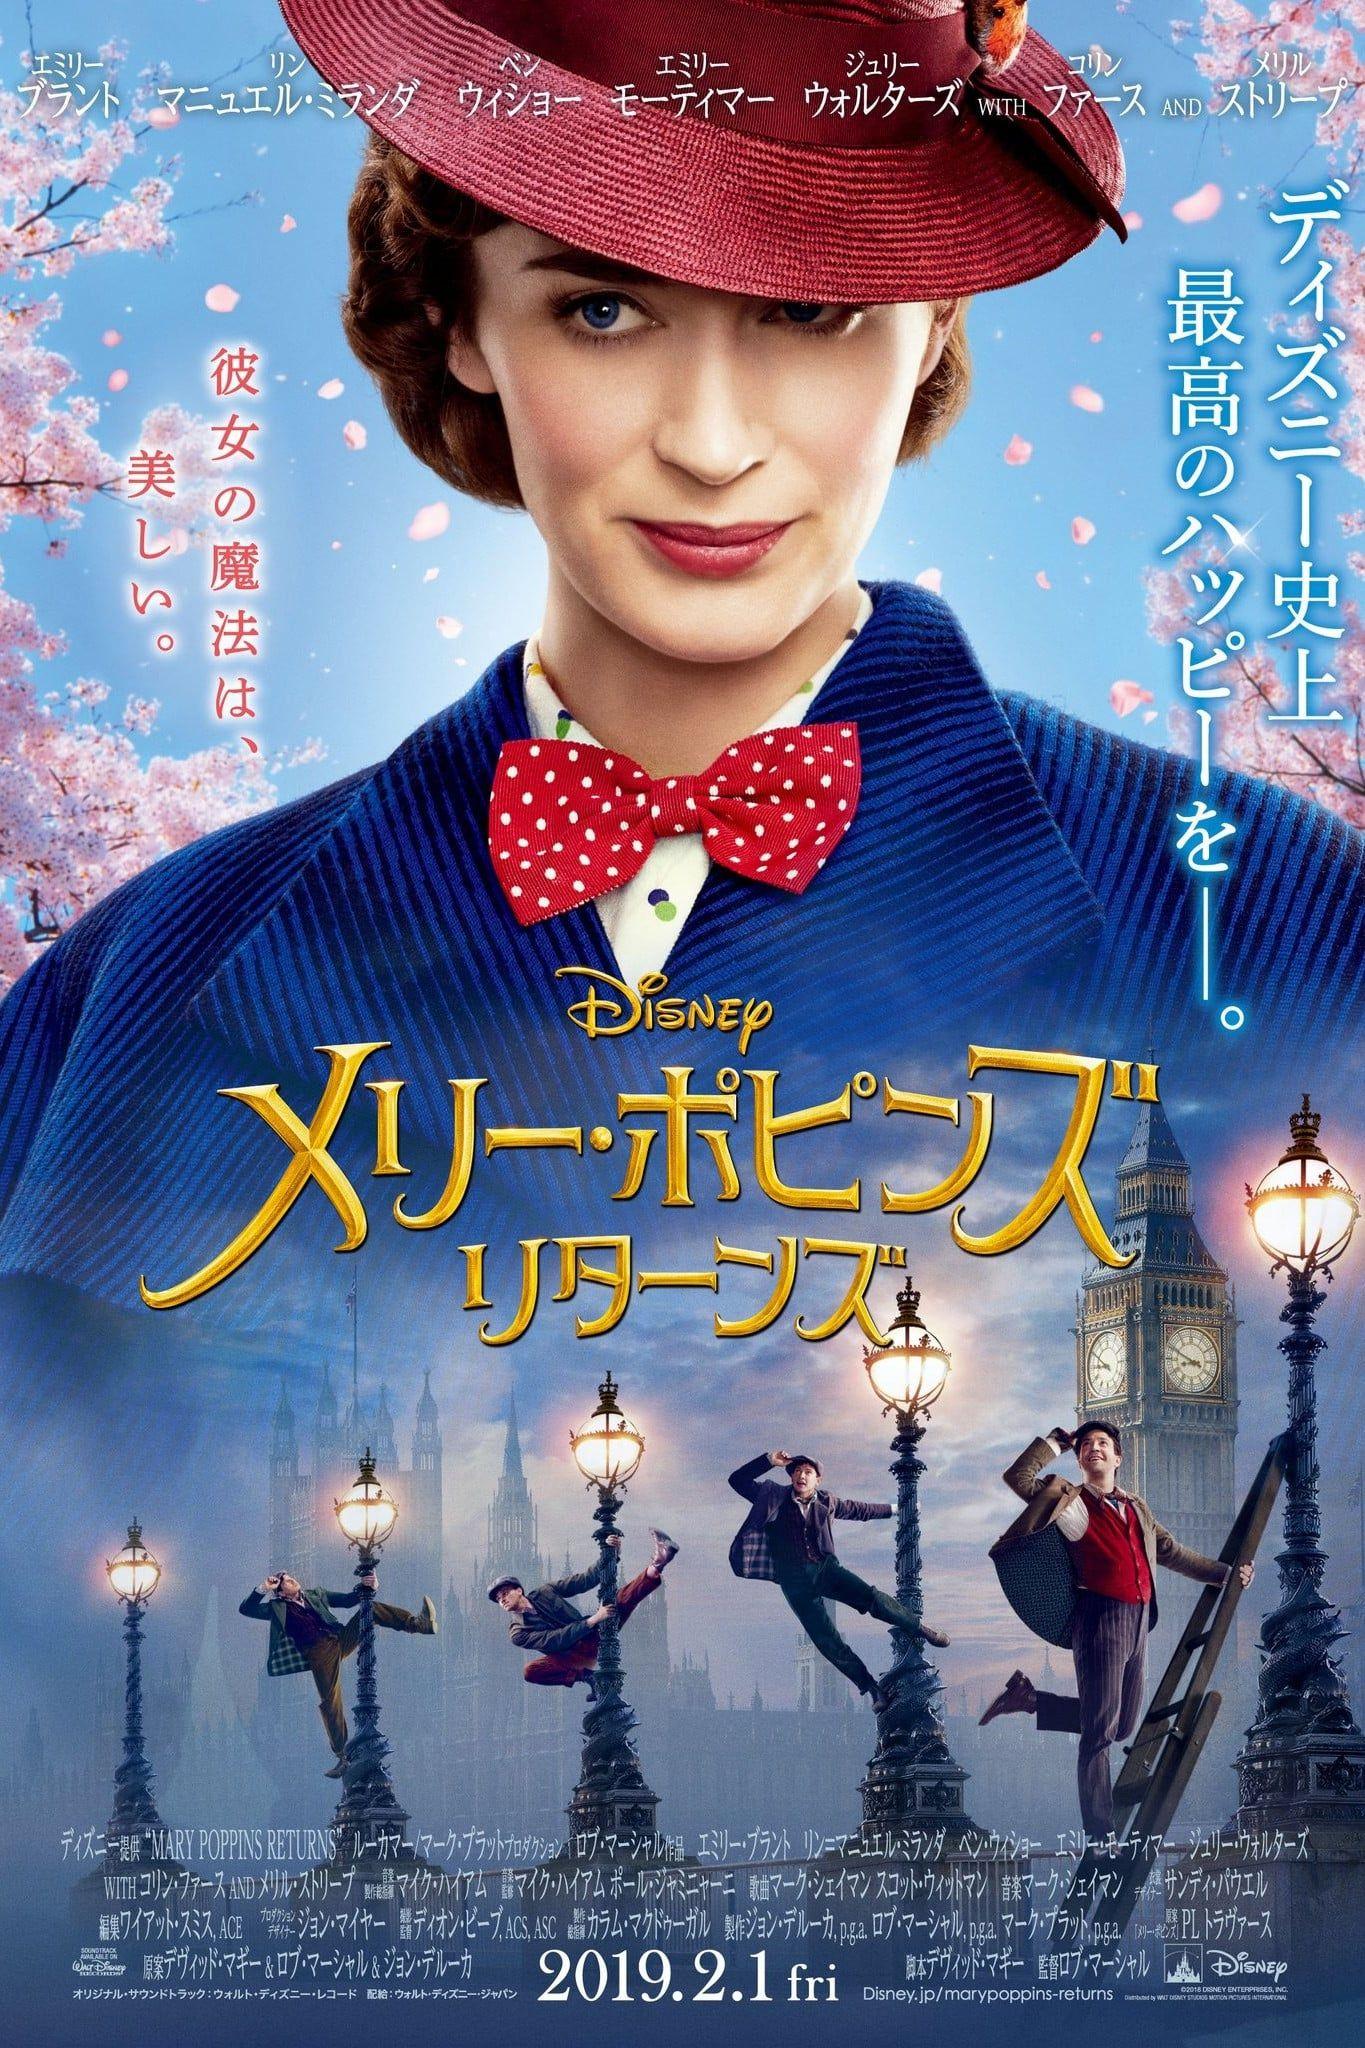 Hd 1080p Mary Poppins Returns 2018 Pelicula Online Completa Esp